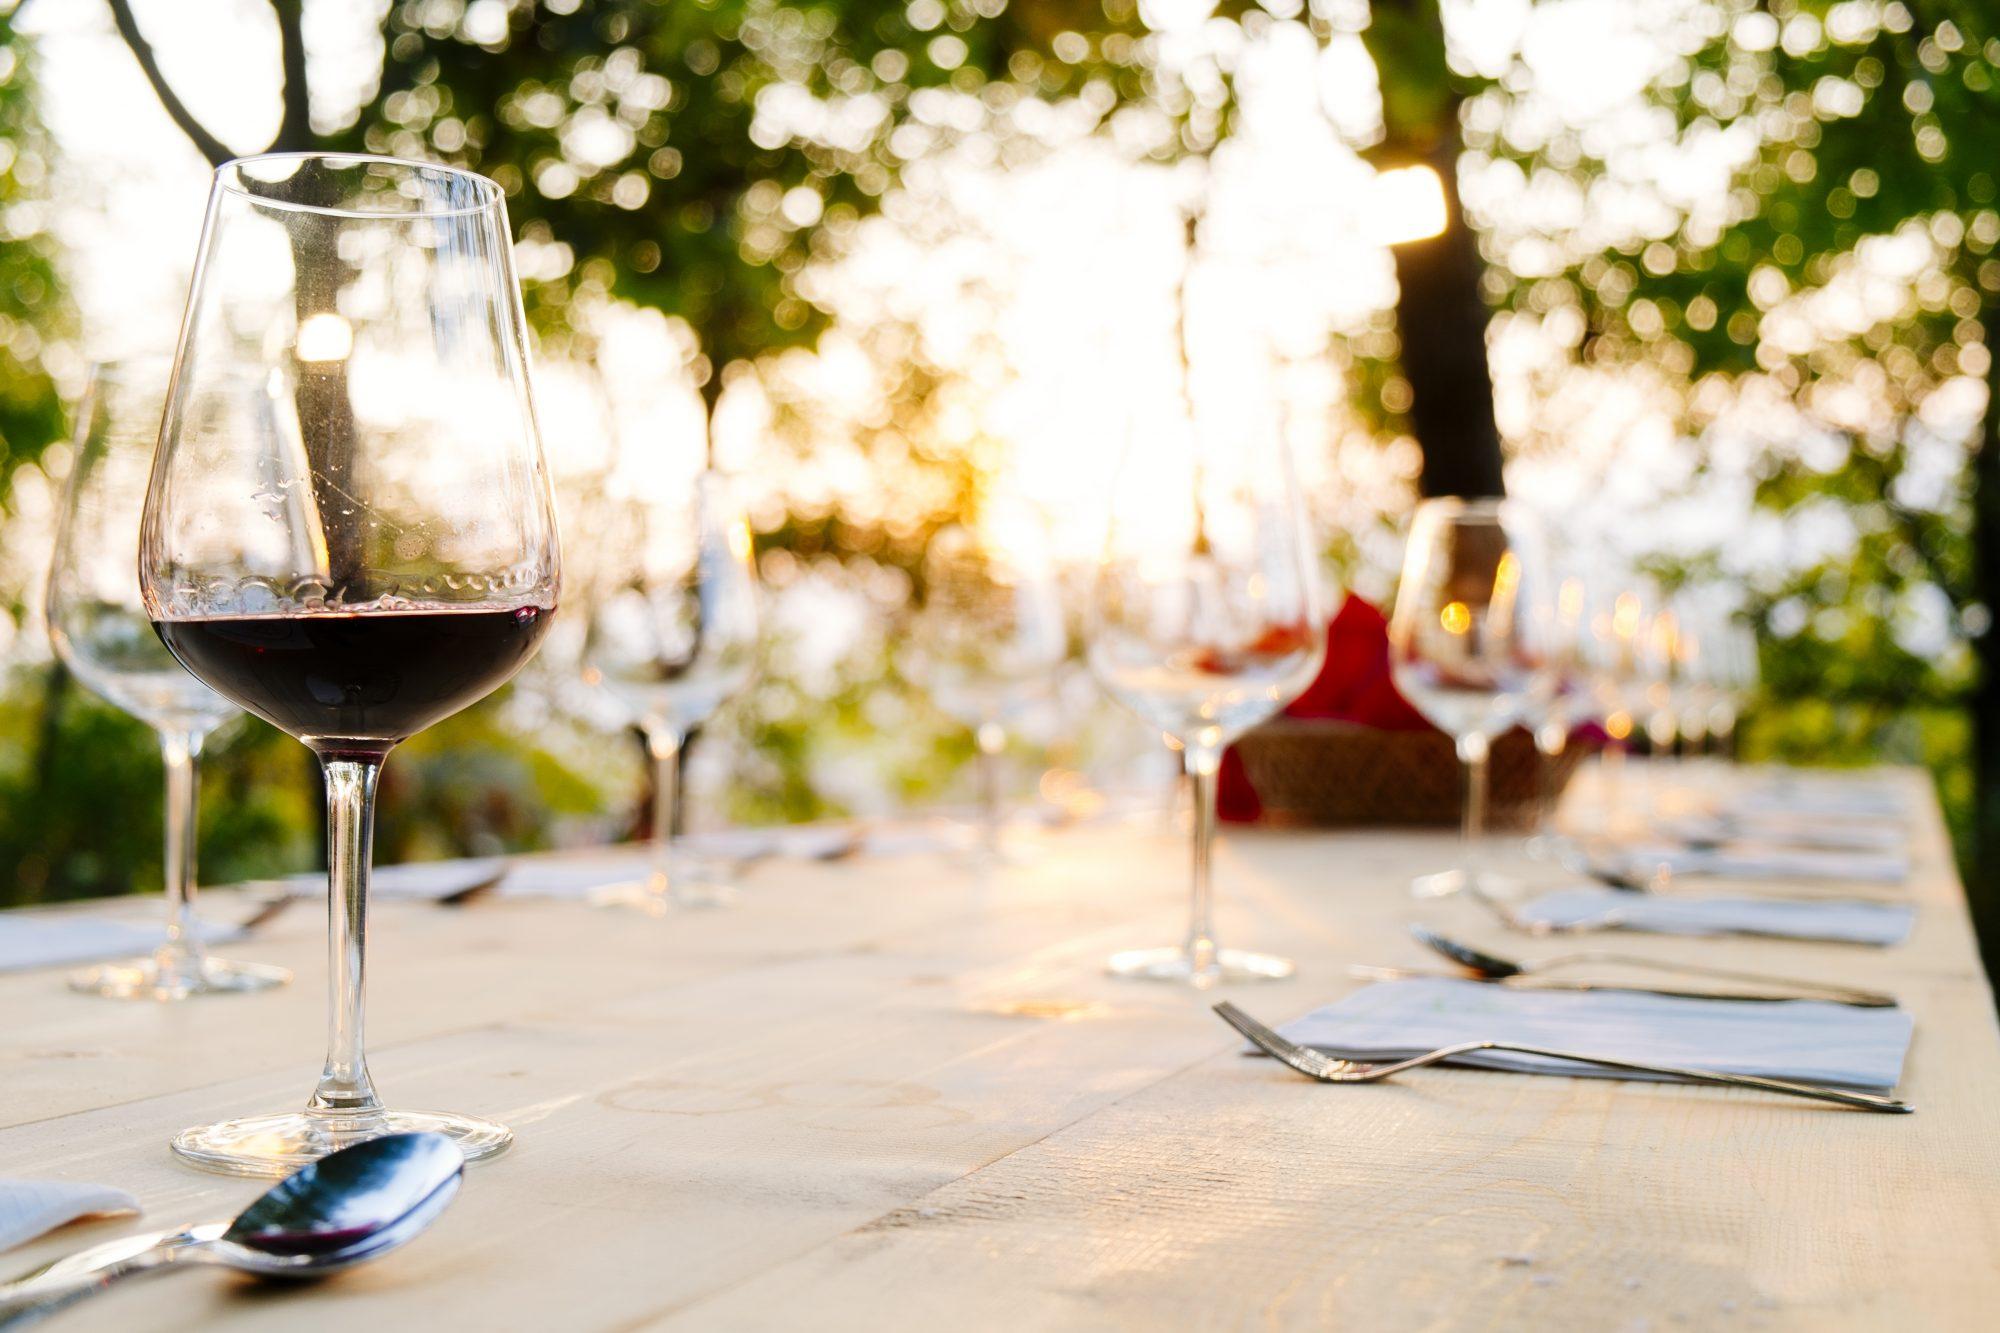 Supper at Sunset set for September 26th